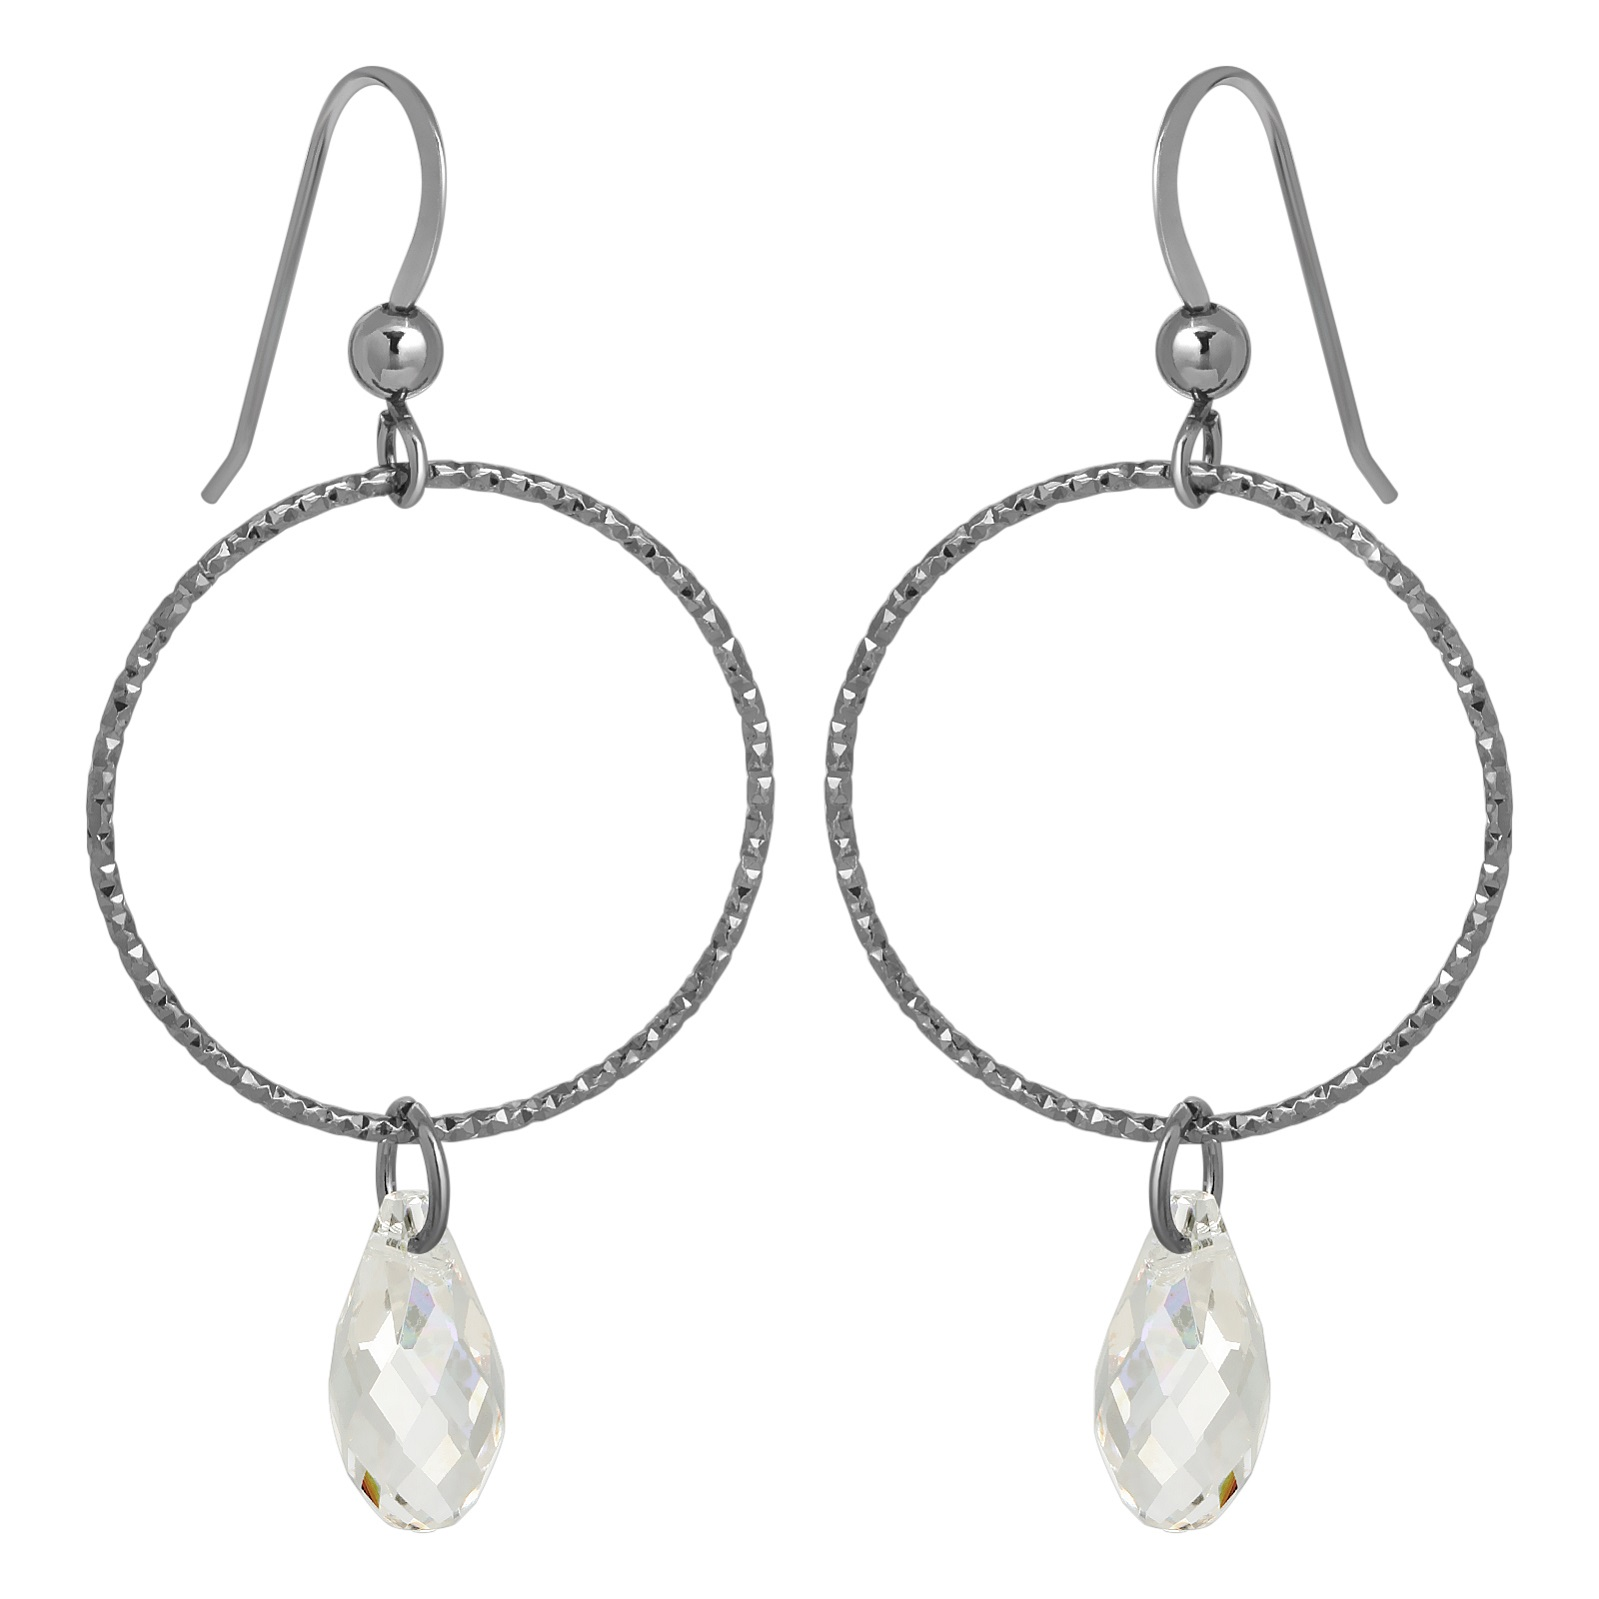 Oxidized Silver Diamond Cut Hoop w/ Swarovski Elements Crystal Earrings - Clear Patina